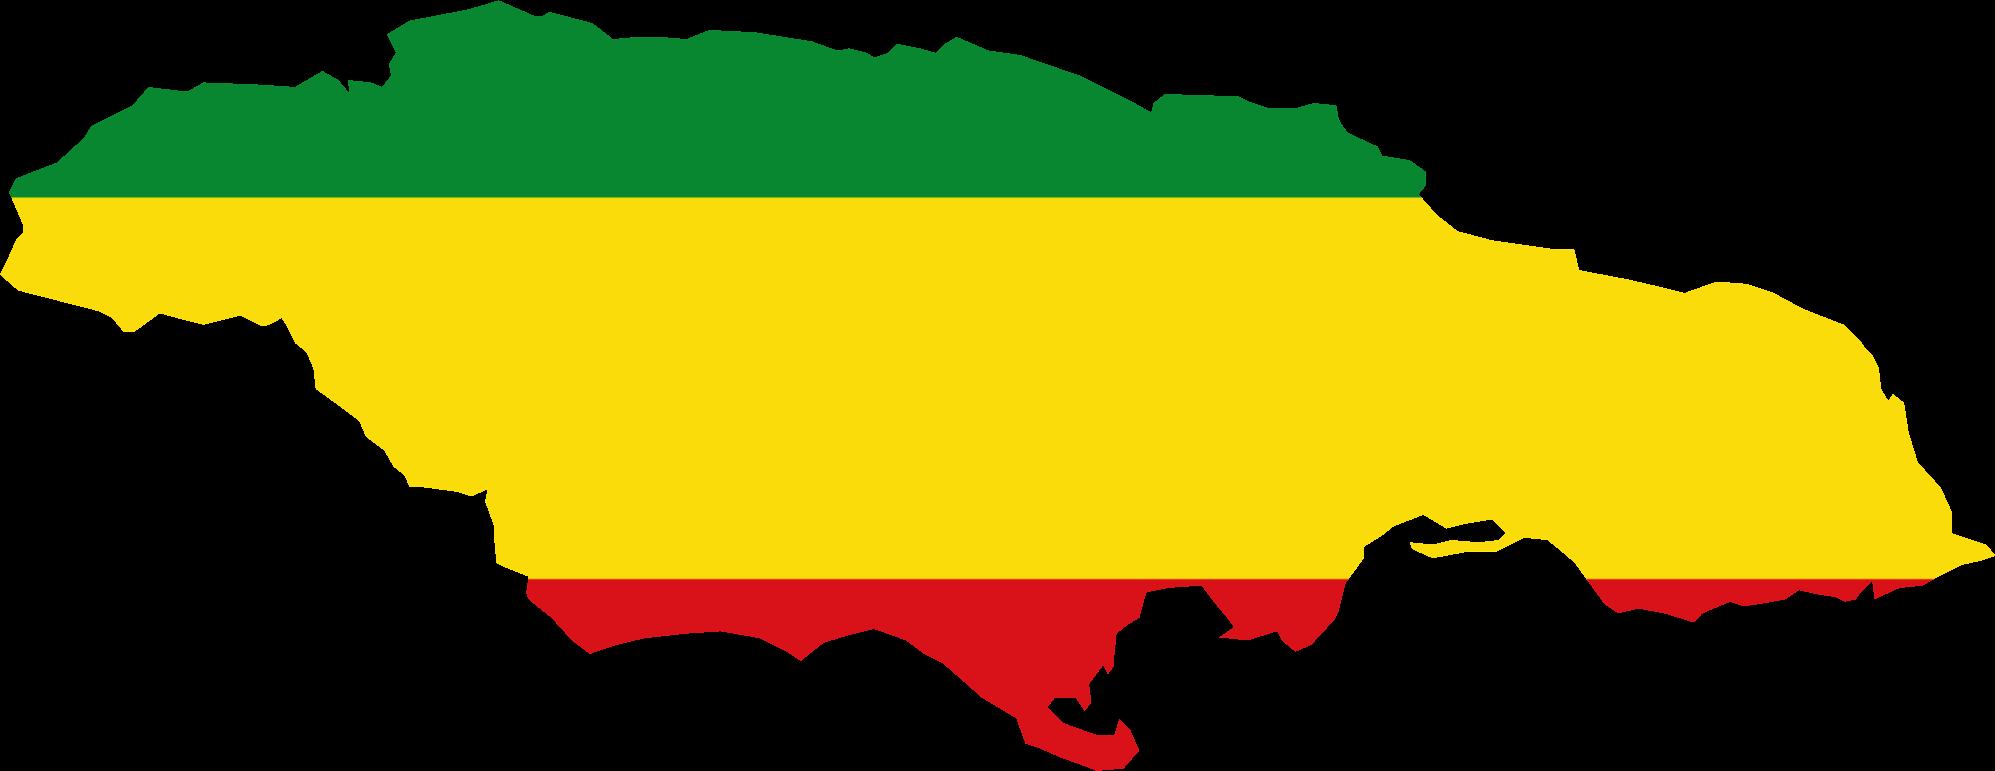 FileFlag map of Jamaica Rastafarianpng  Wikimedia Commons